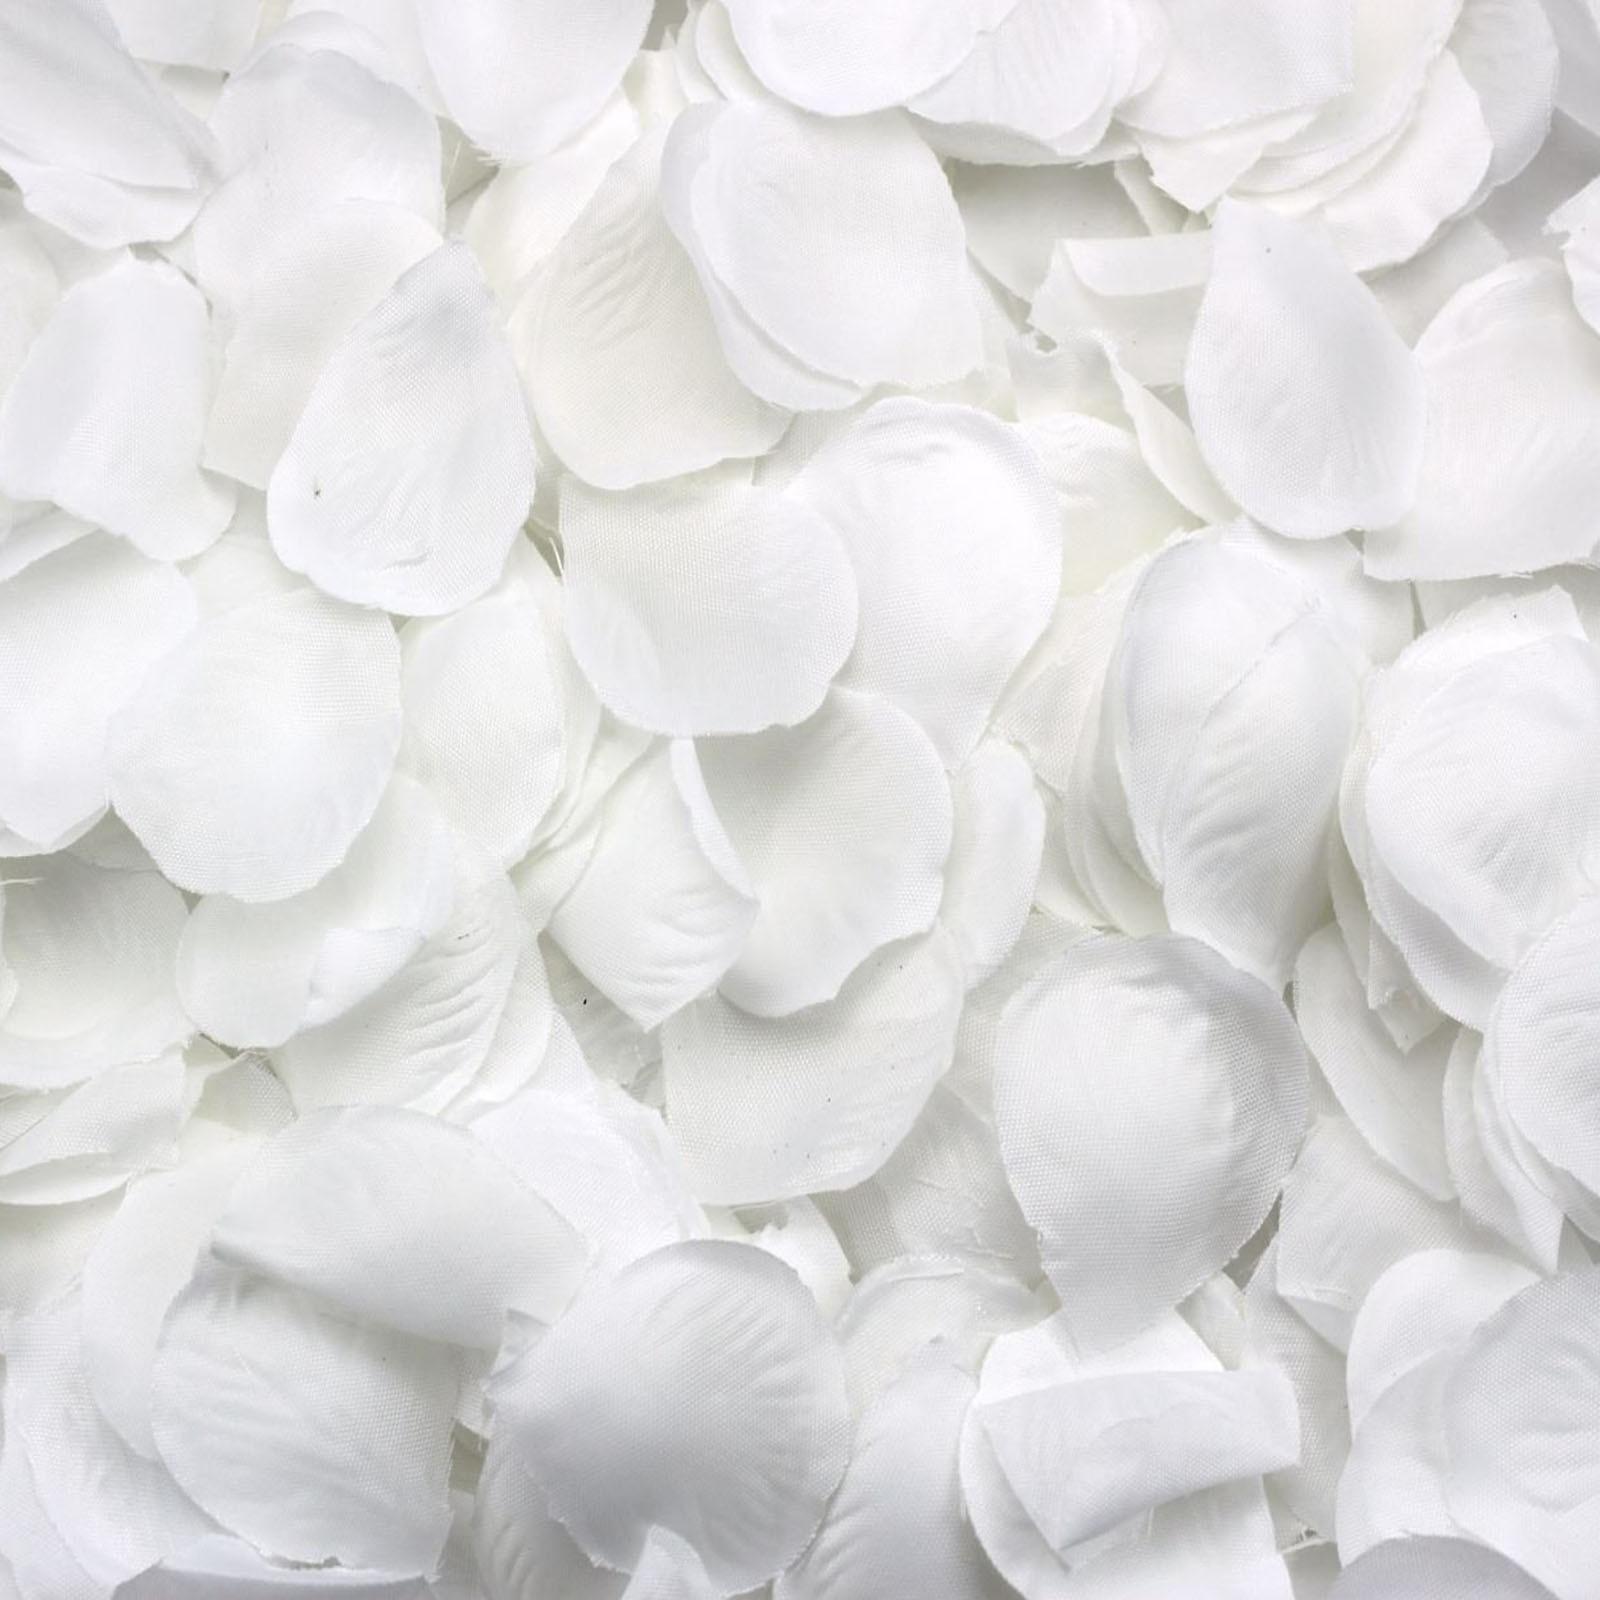 500Pcs Fabric Rose Petals Artificial Flower Wedding Party